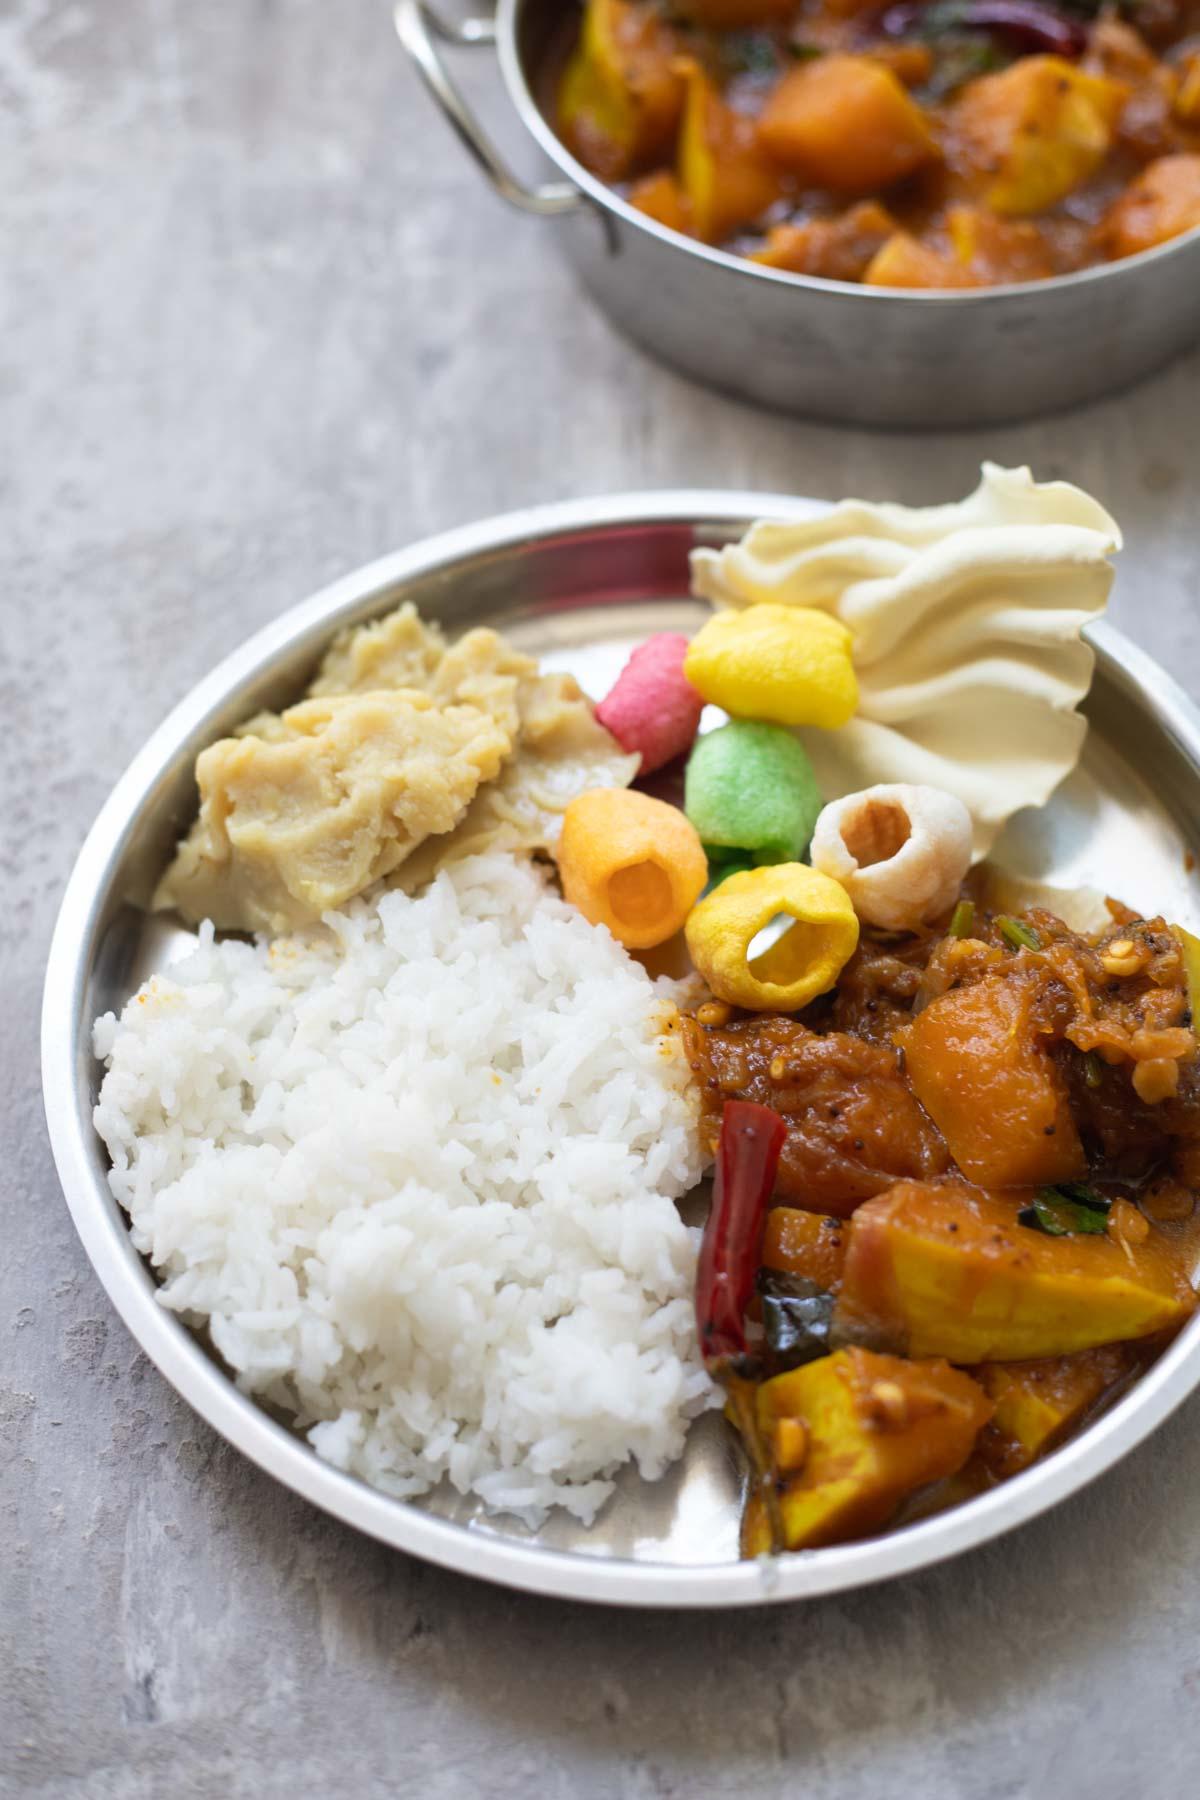 an ndian thali plate with rice, gummadikaya pulusu ,dal, papads